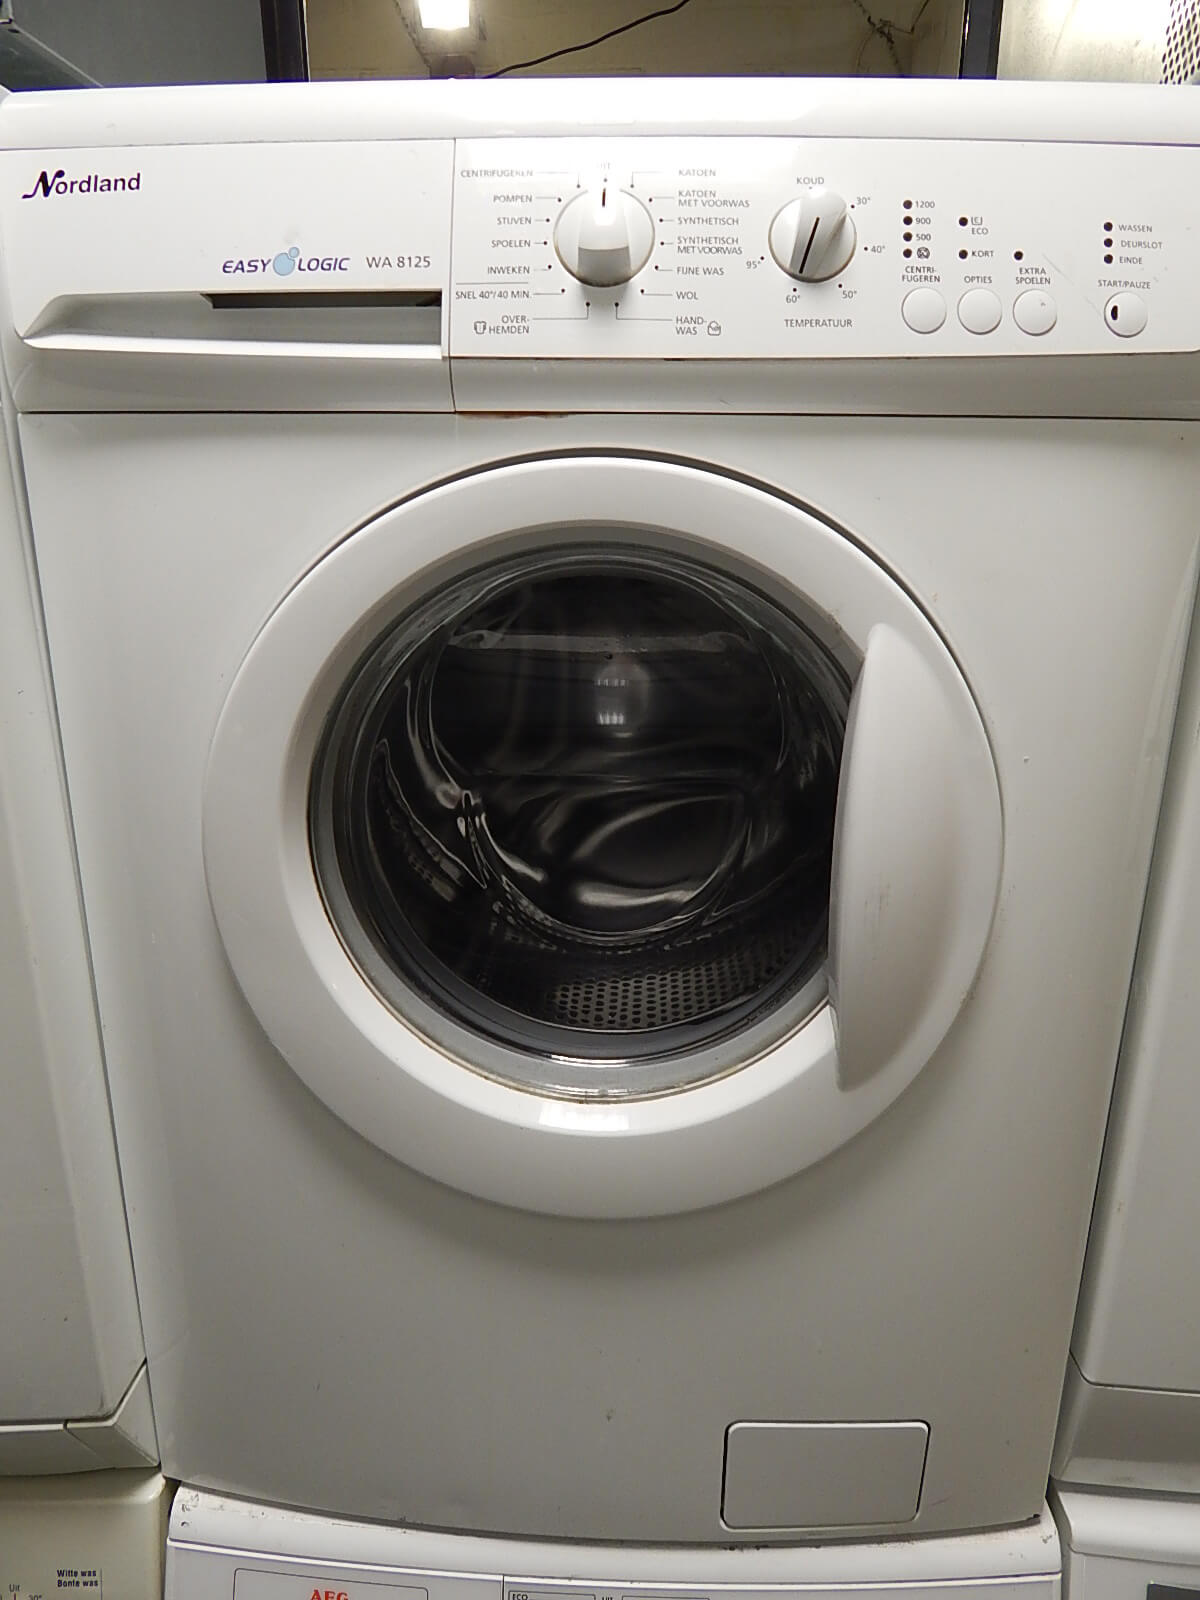 Nordland wasmachine kopen